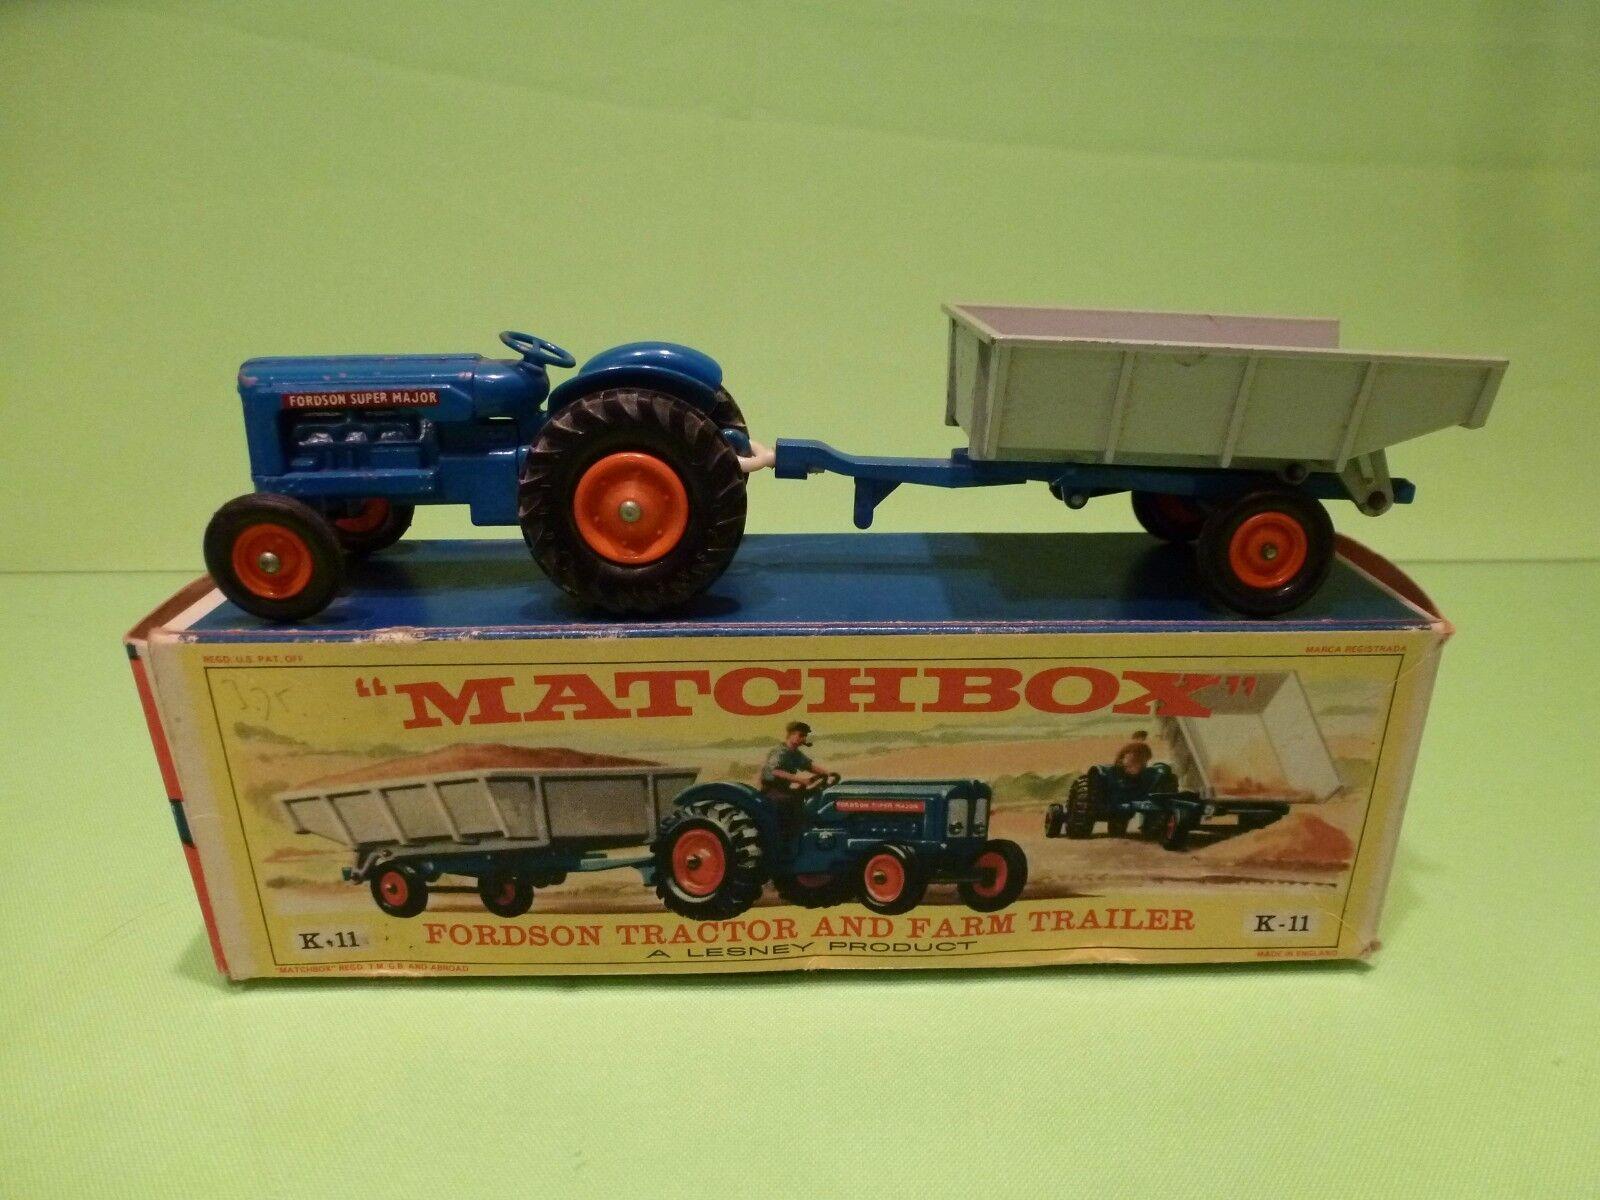 alta calidad general MATCHBOX LESNEY K-11 FORDSON TRACTOR + FARM TRAILER - - - azul gris - RARE - GIB  ahorra hasta un 70%